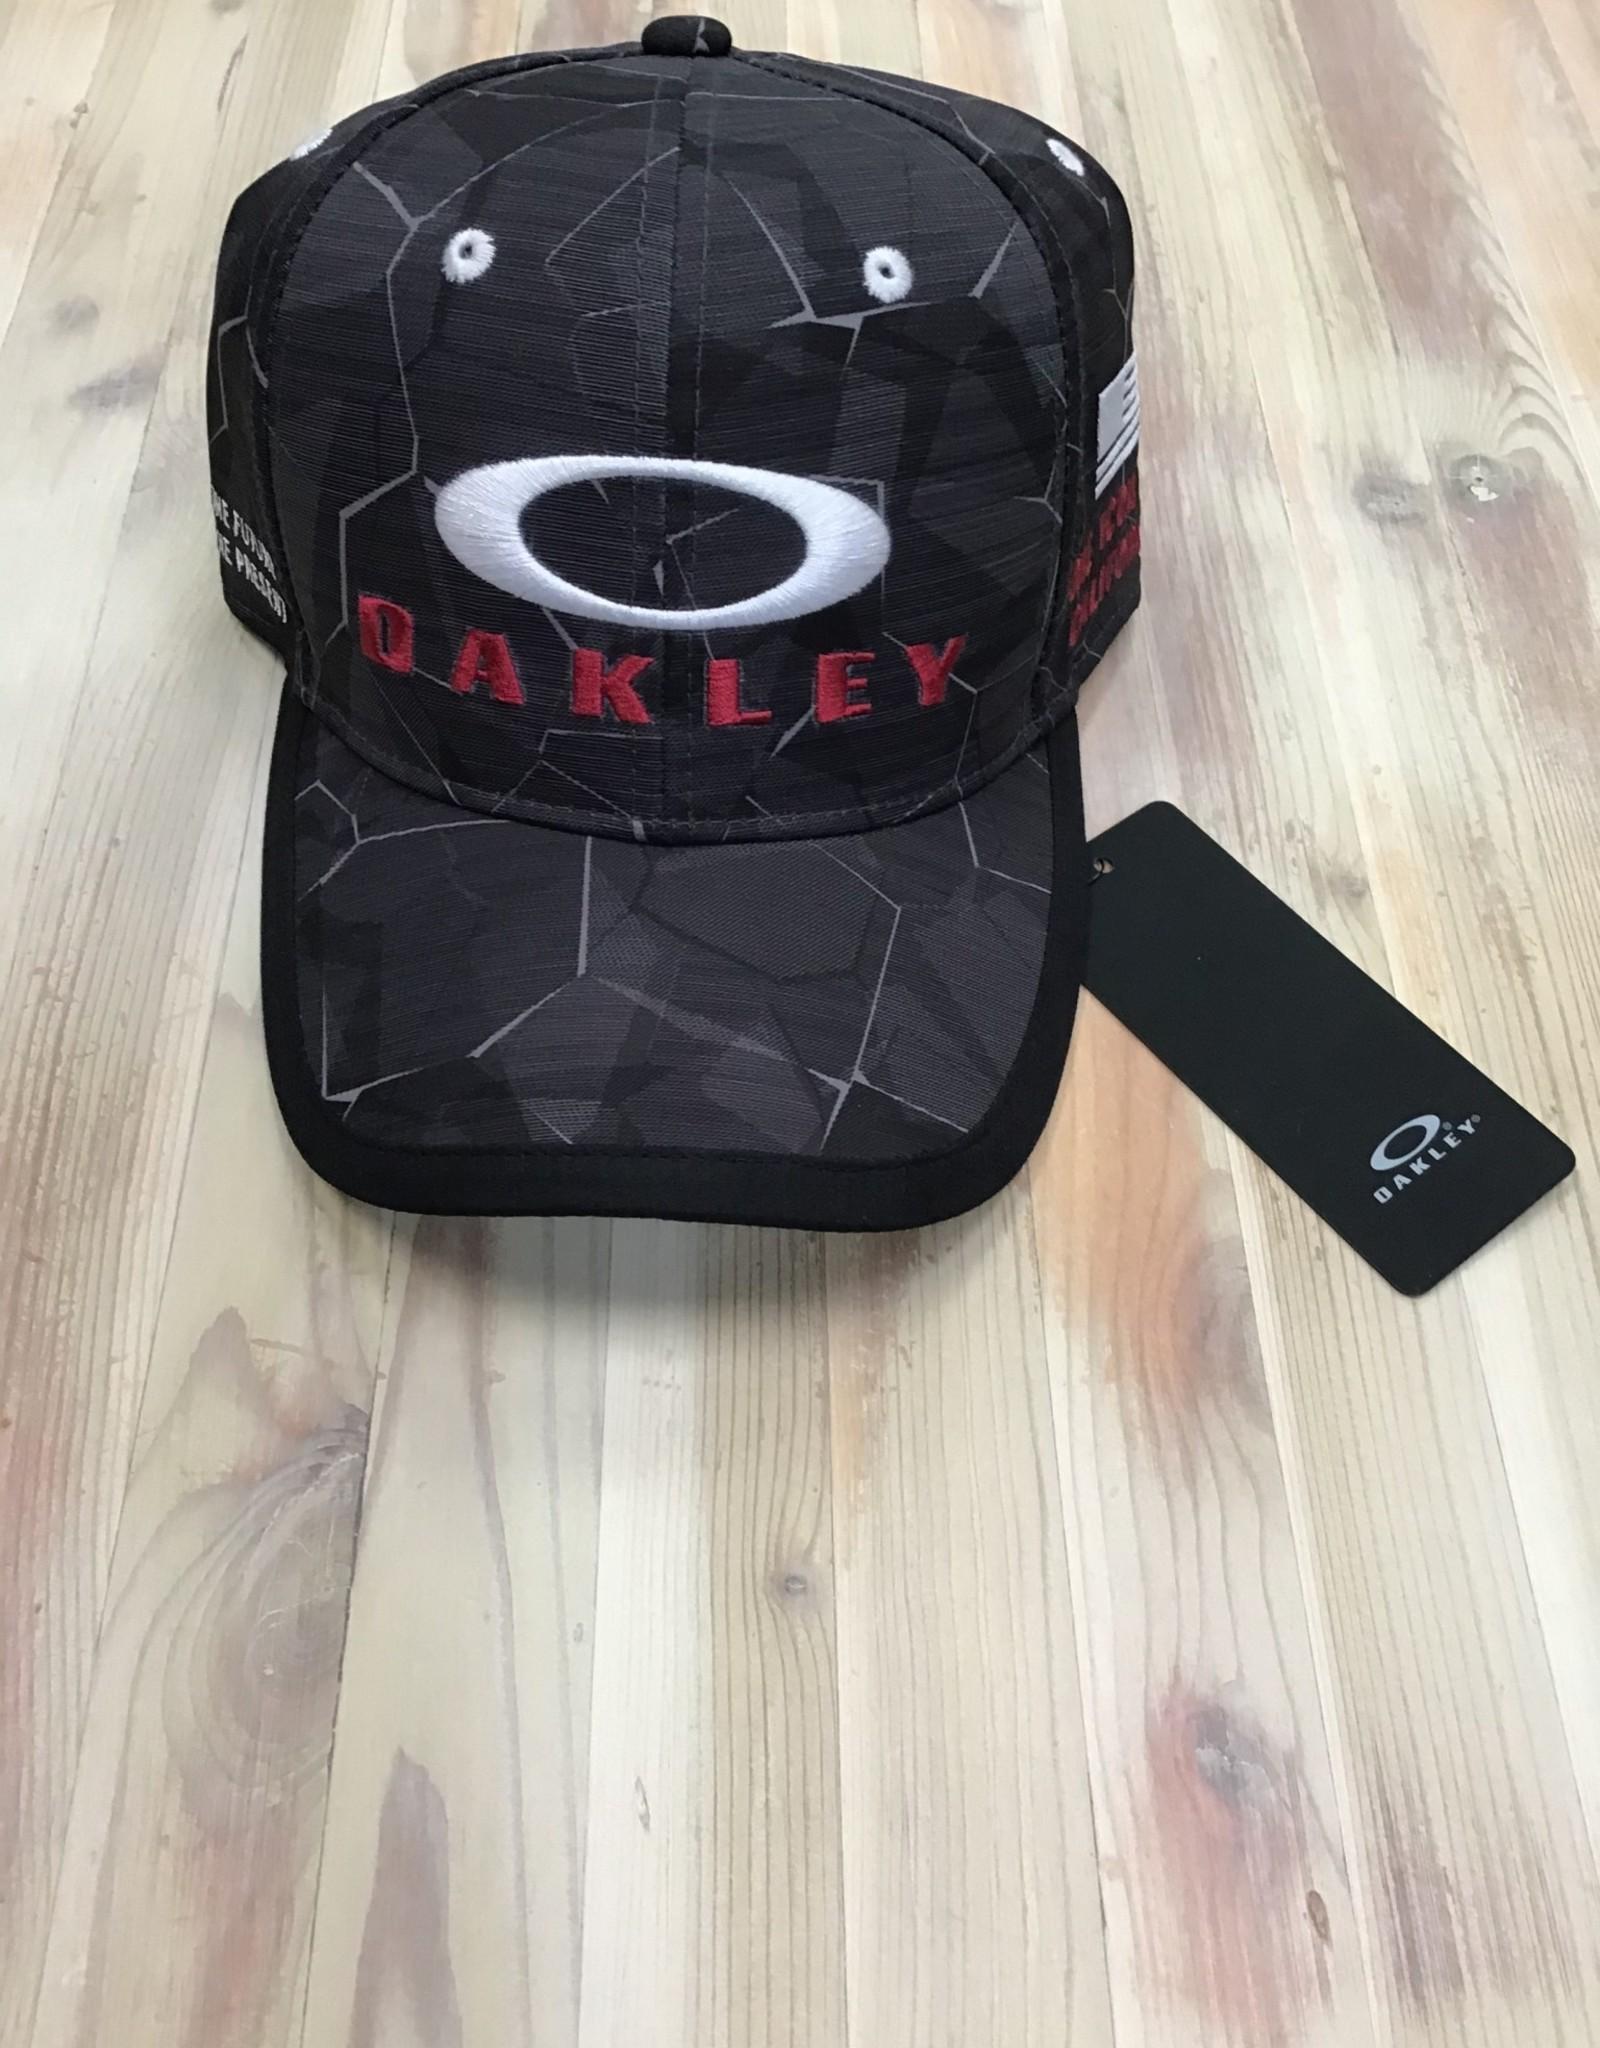 Oakley Oakley BG PT Cap 13.0 Men's